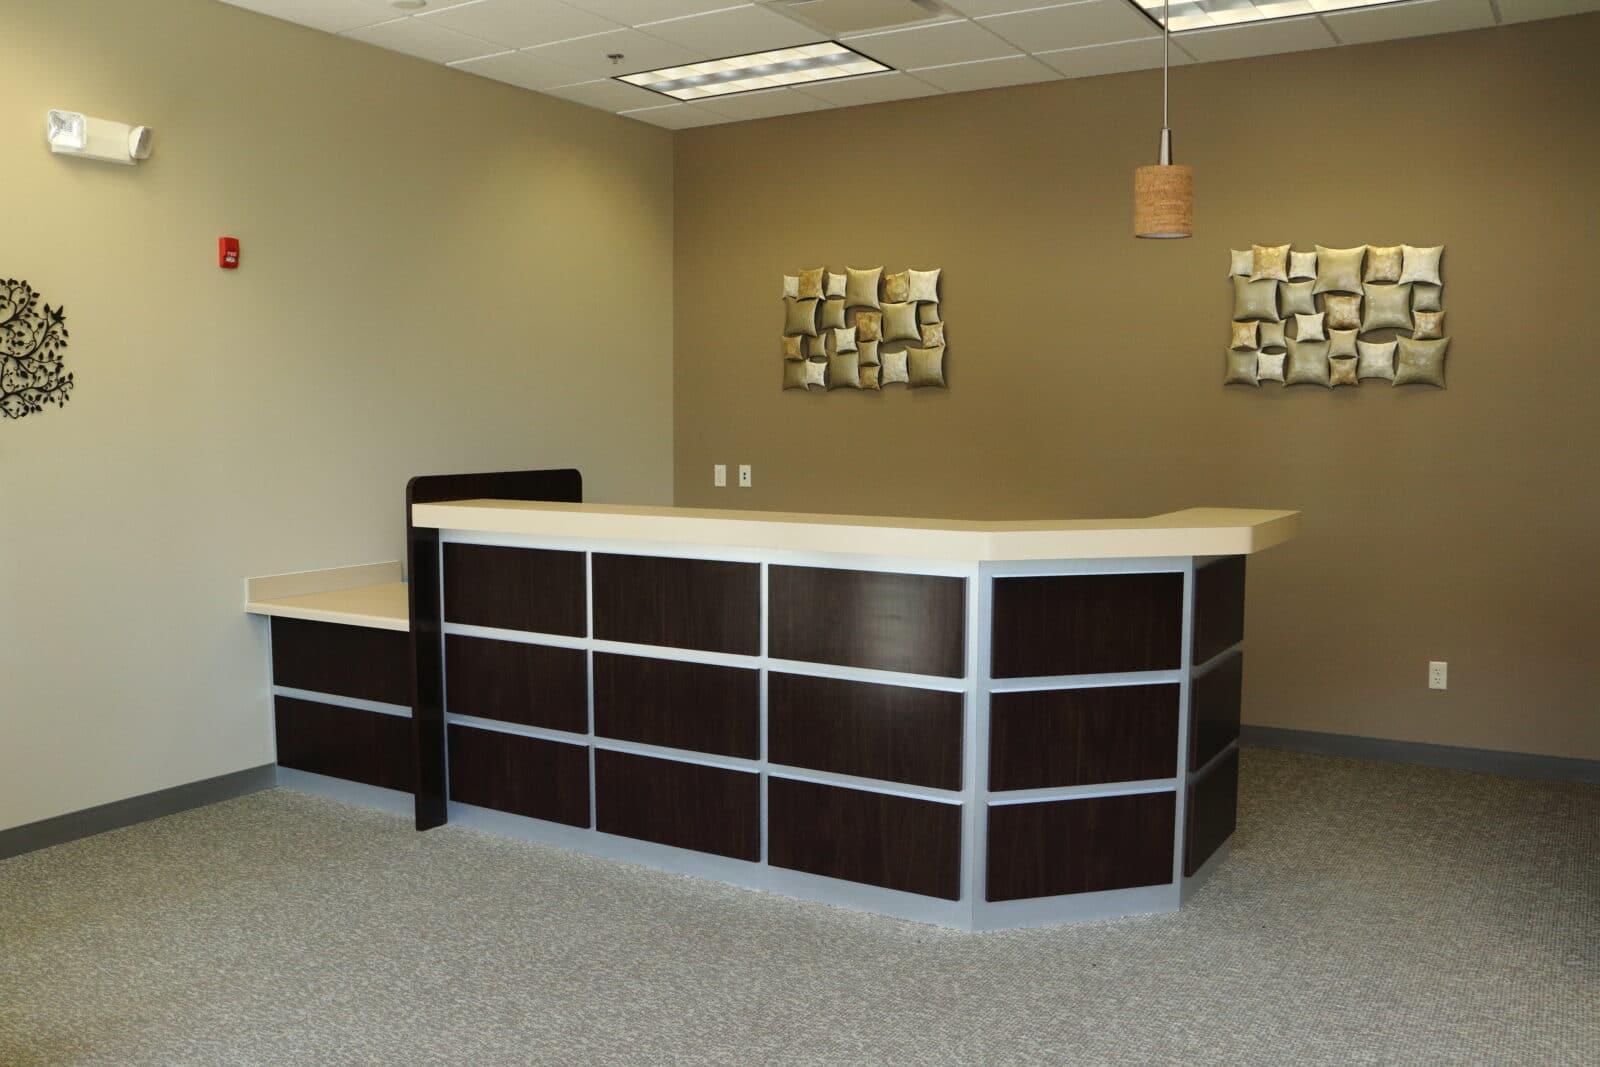 Dermatology Associates of Wisconsin, construction management associates, general contractors